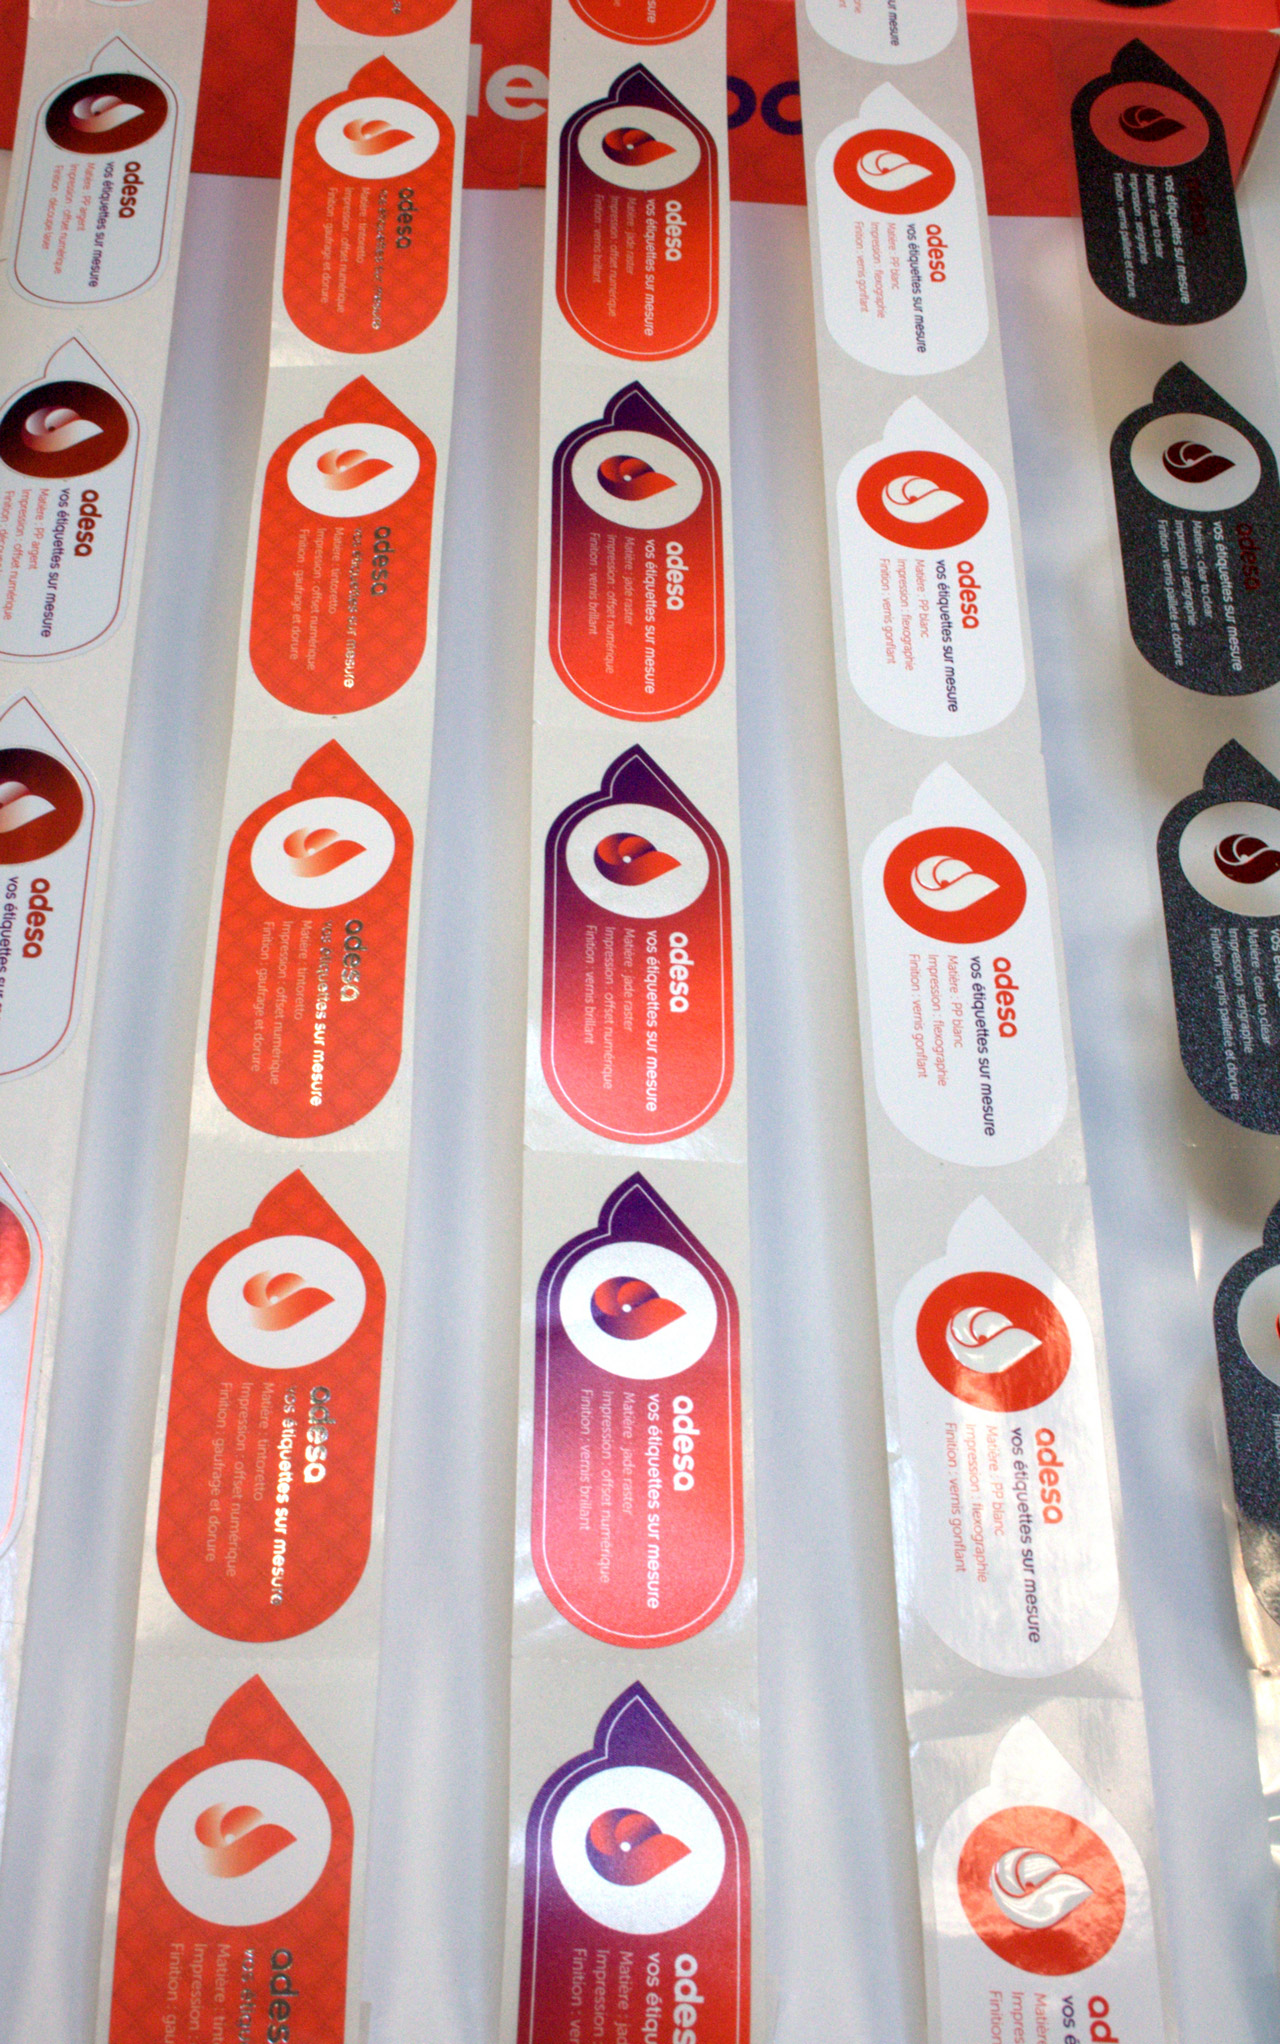 adesa-creation-packaging-etiquettes-caconcept-alexis-cretin-5